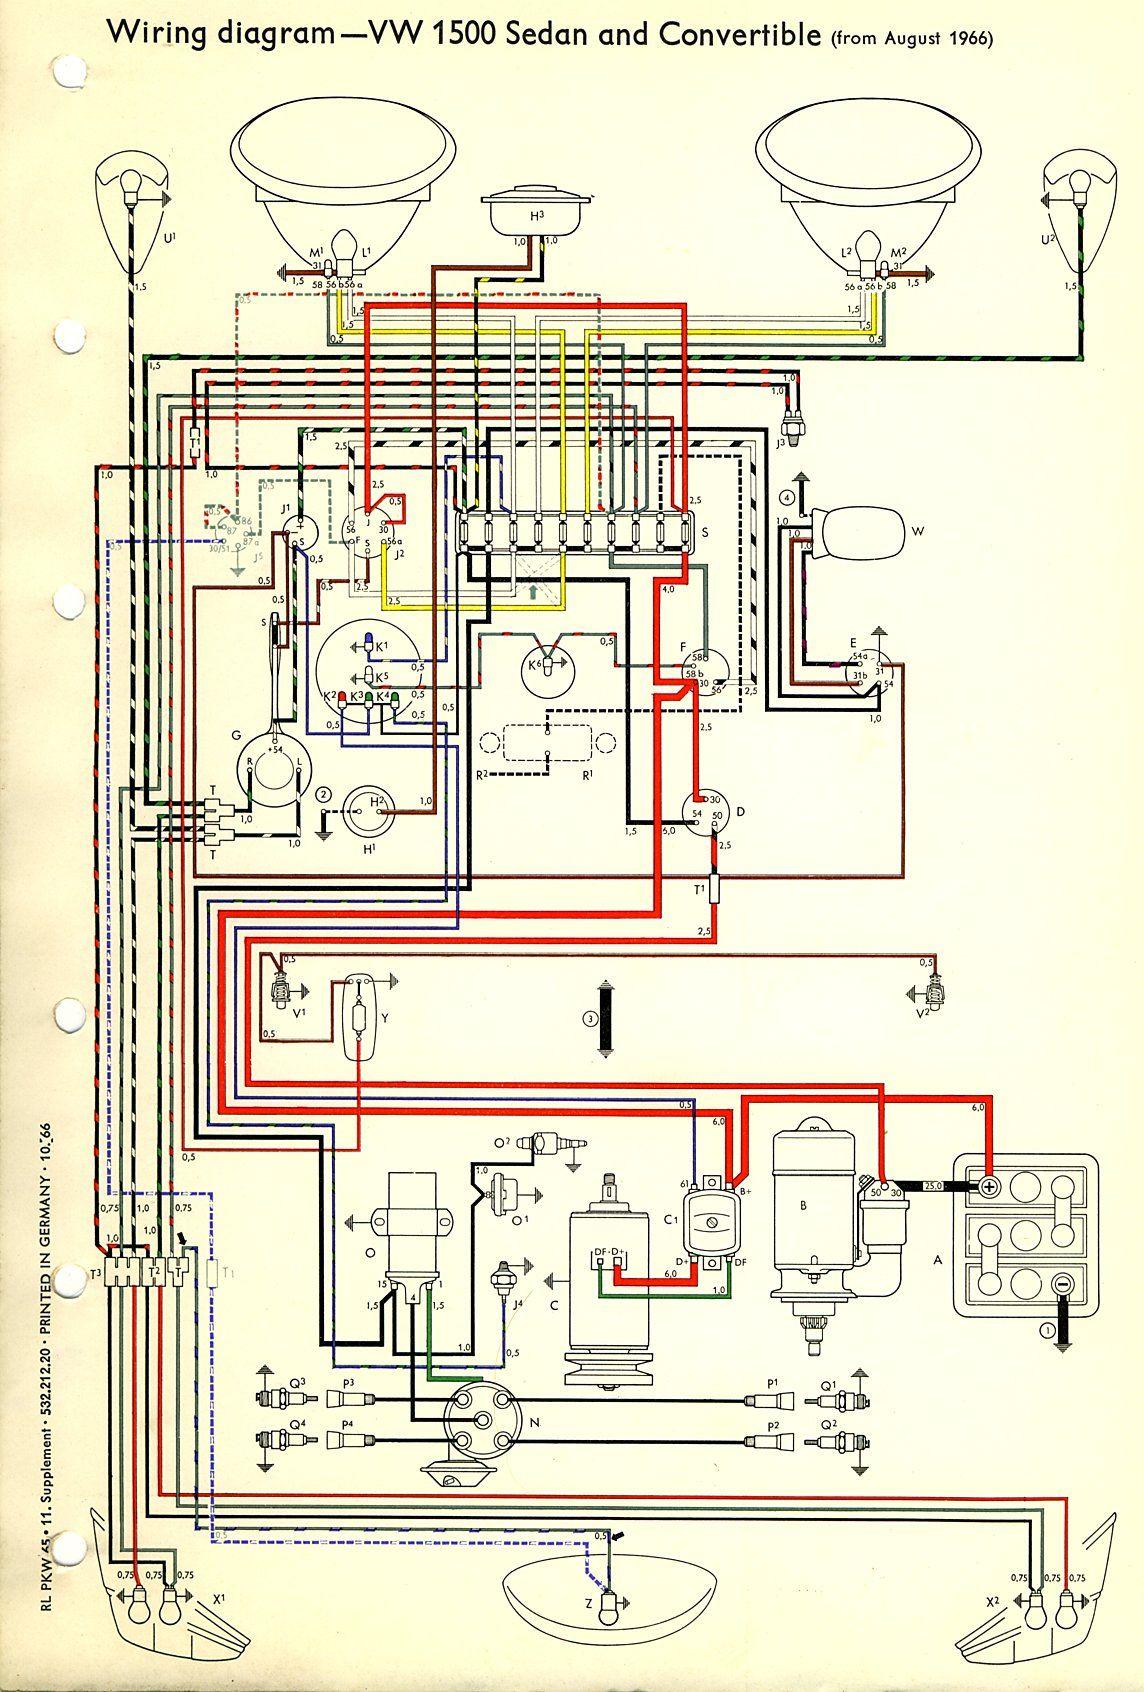 67 Beetle Turn Signal Wiring Diagram